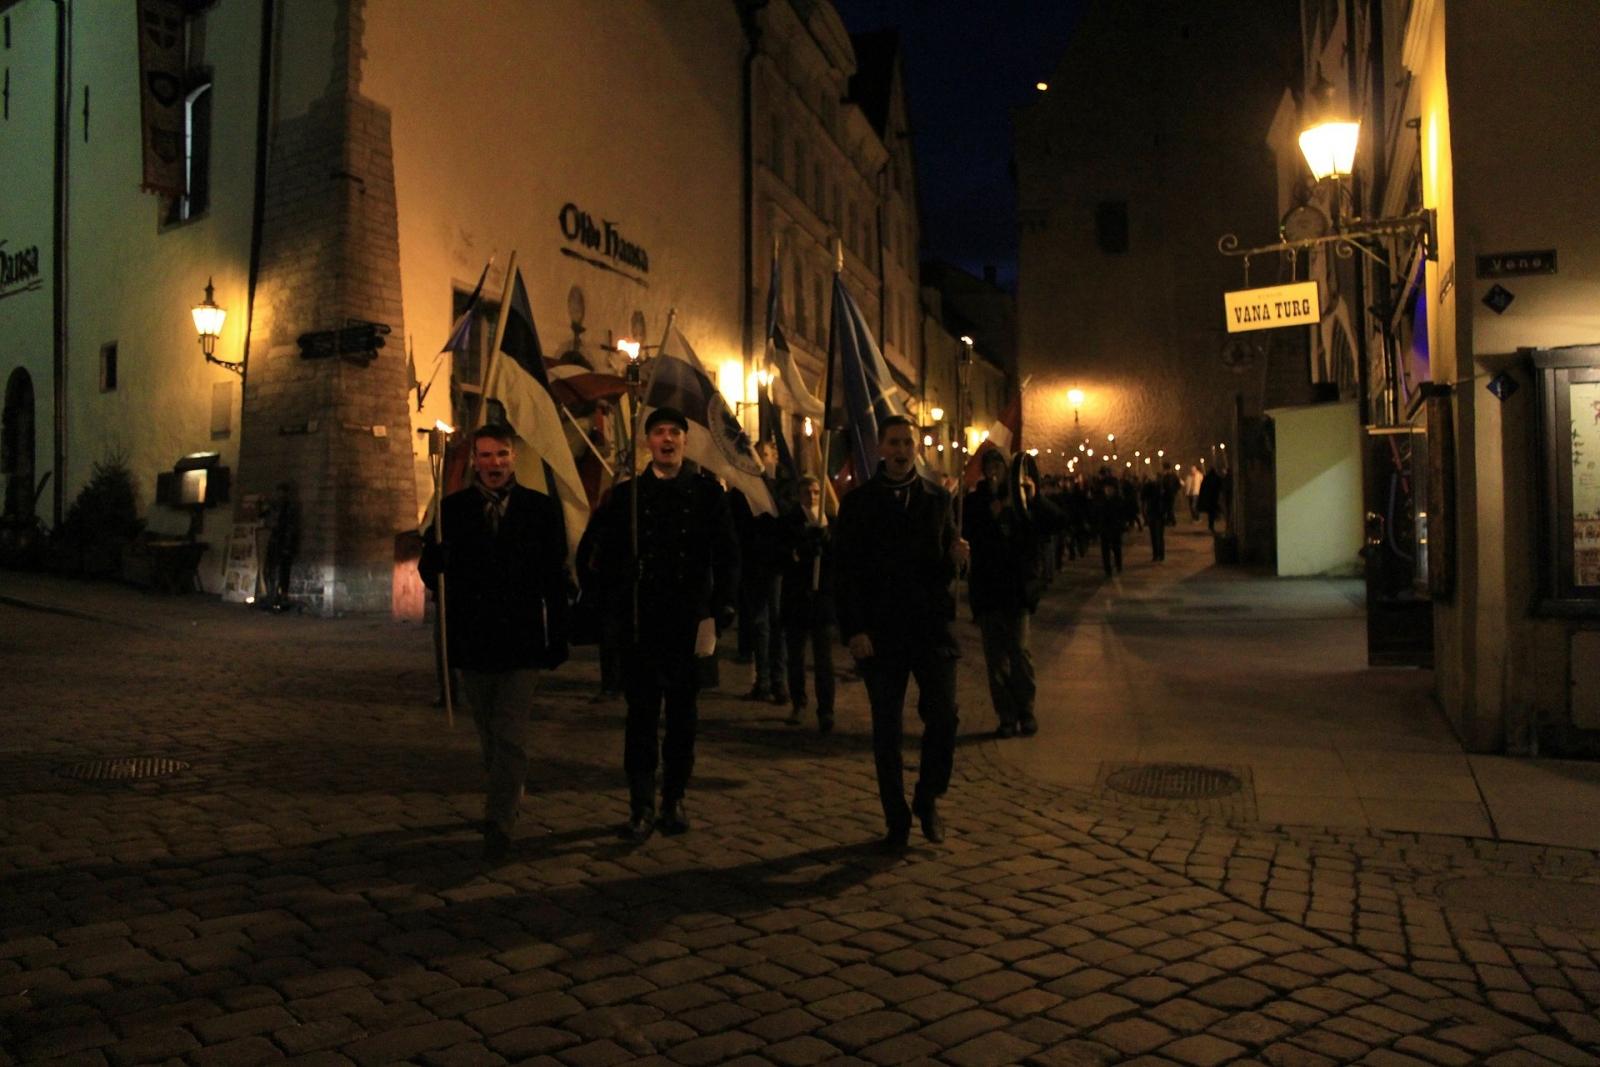 Estonia torchlit parade